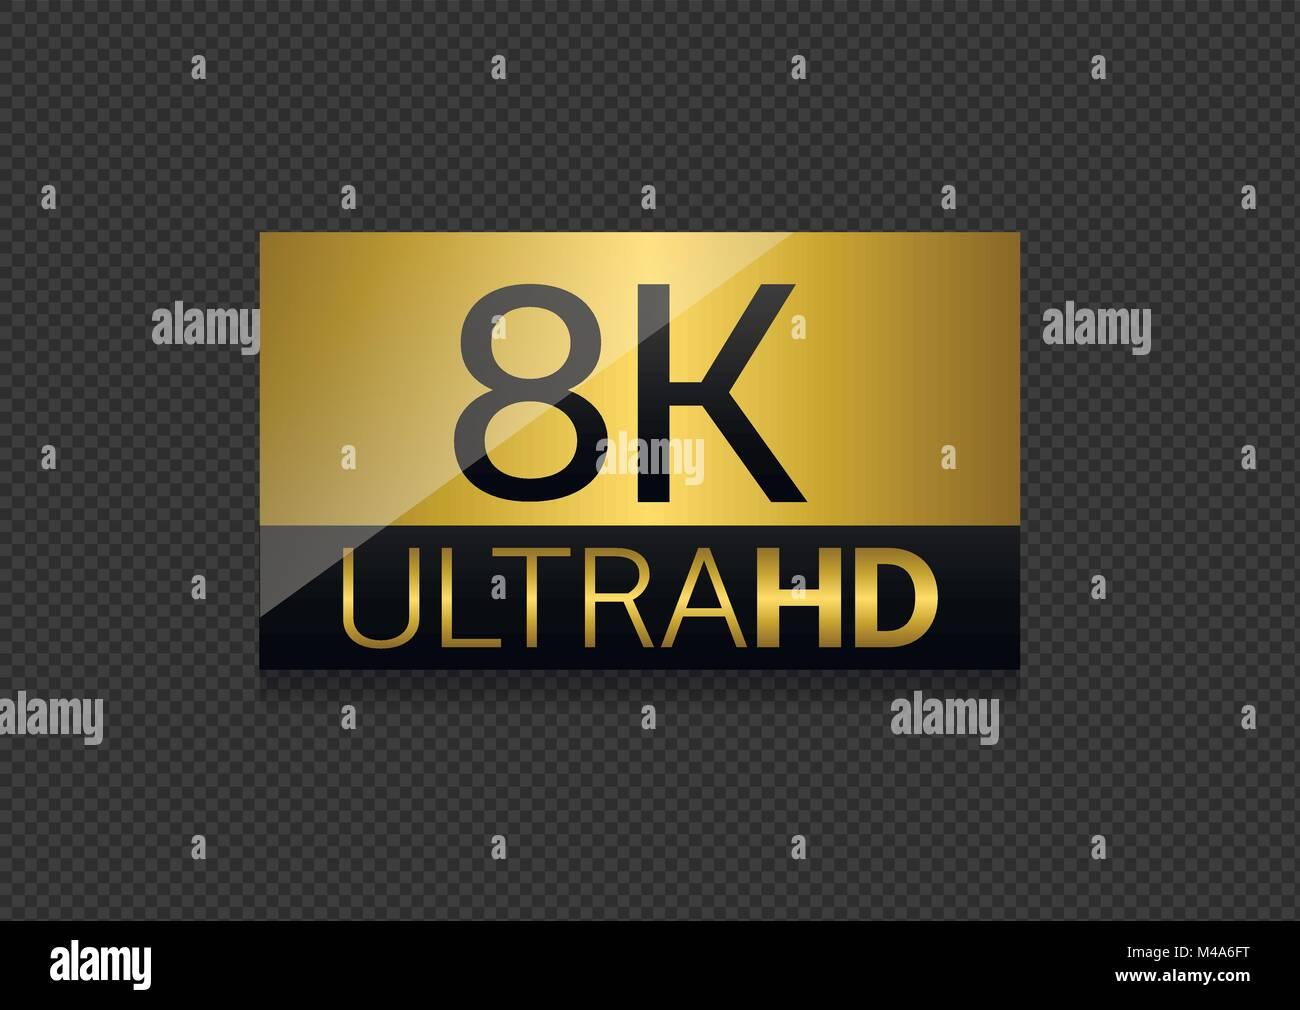 8K Ultra HD label - Stock Image